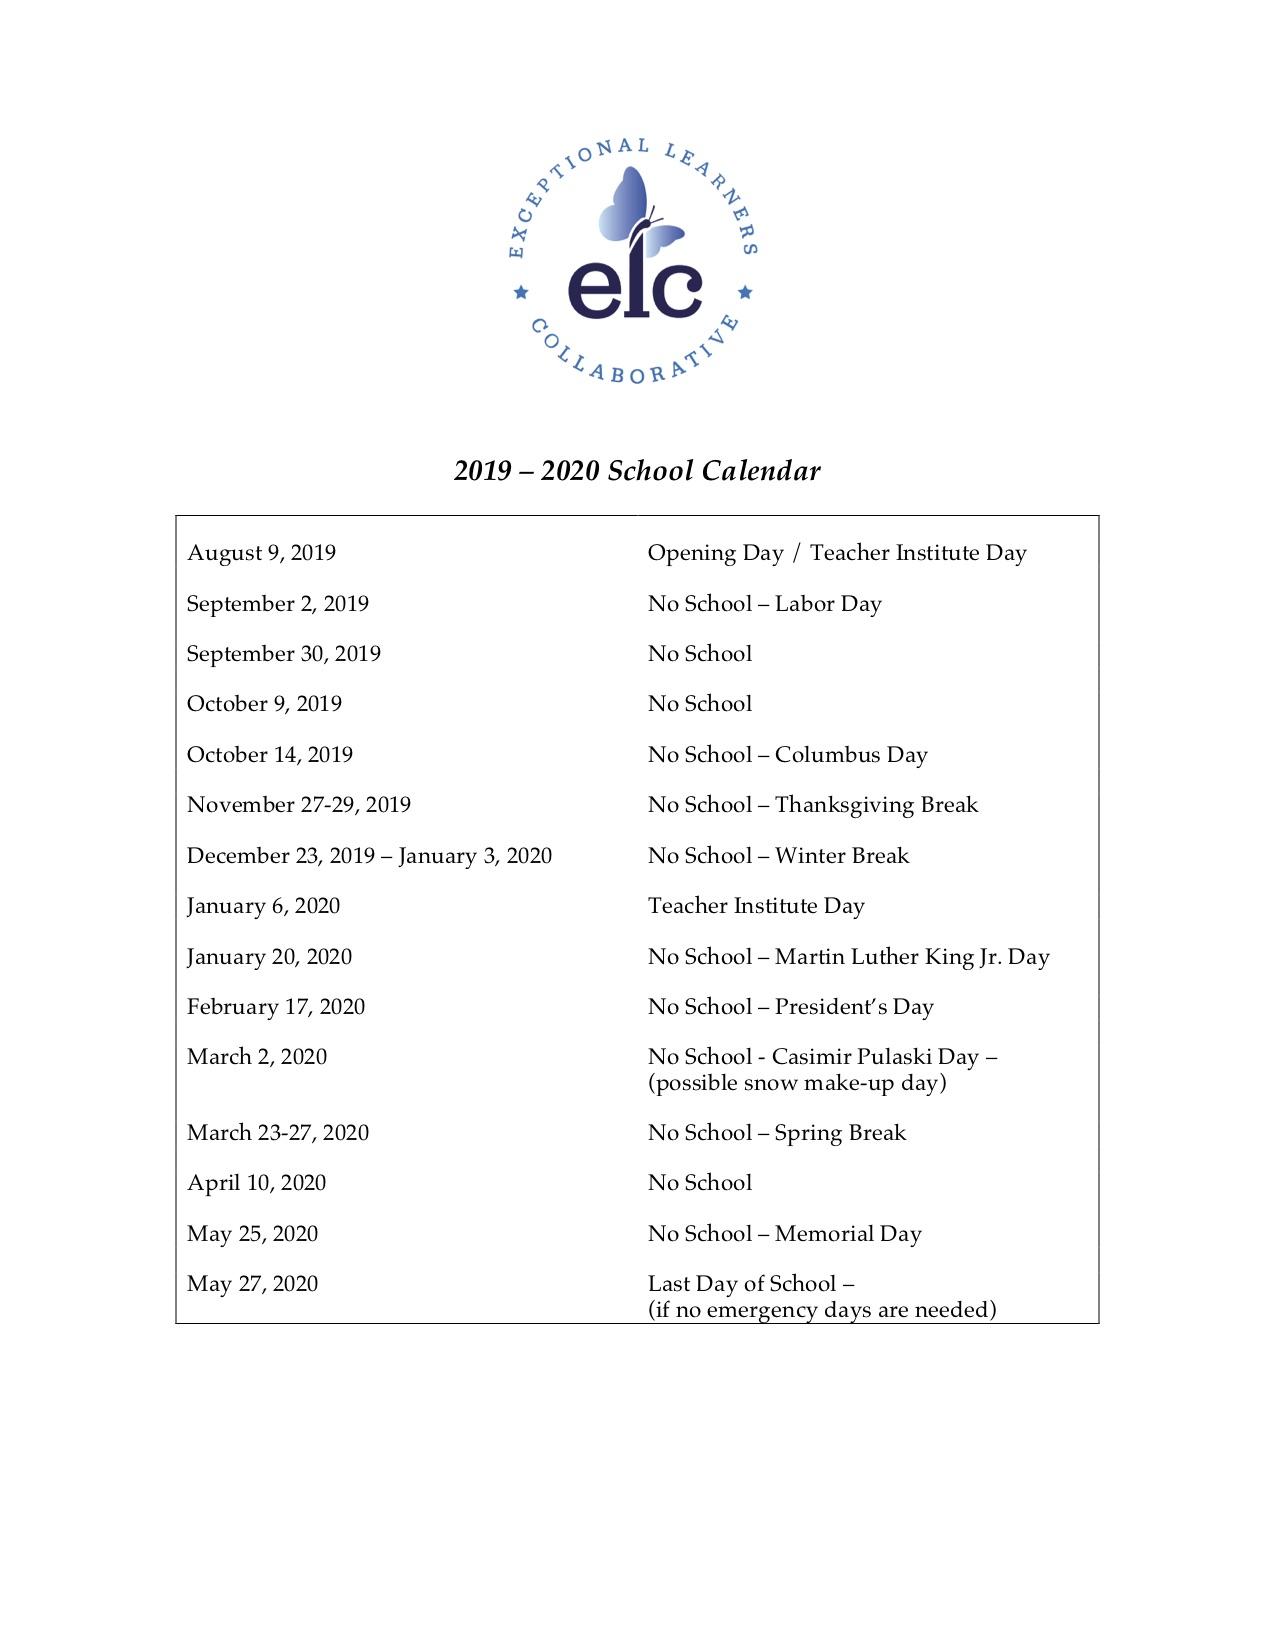 ELC 2019-2020 District Calendar.jpg